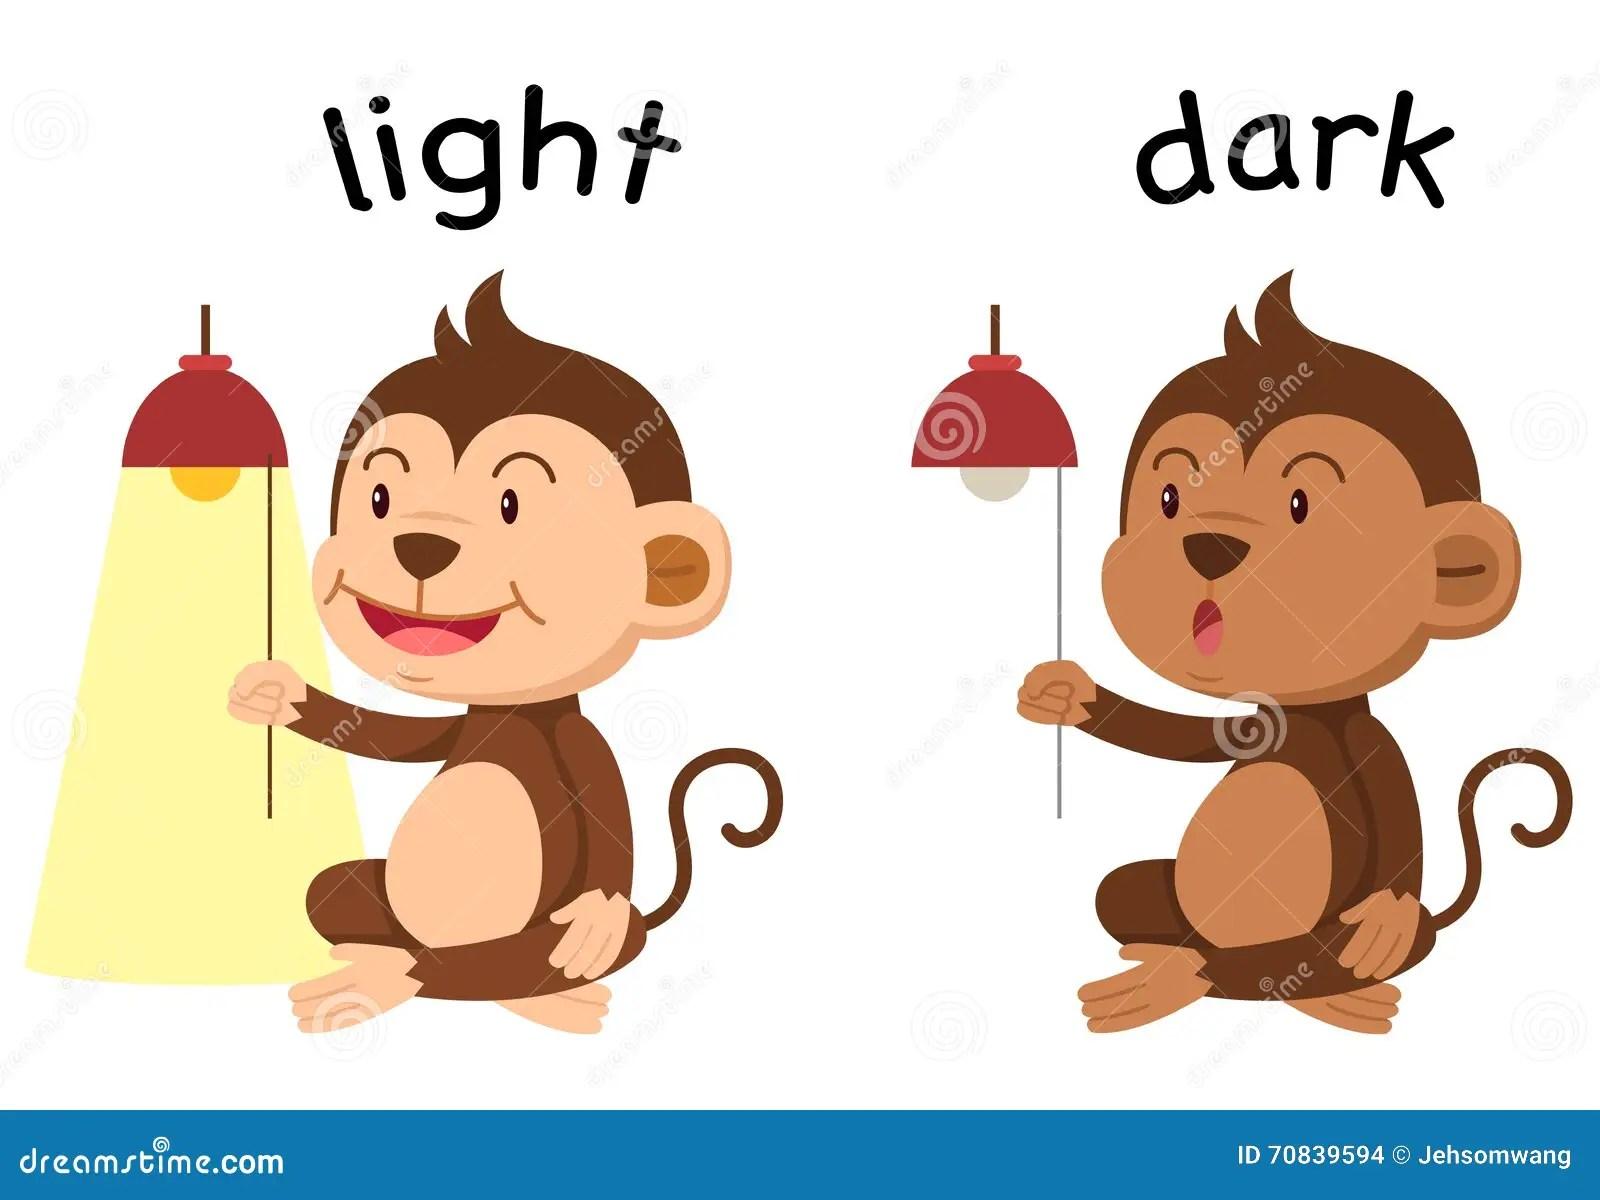 Opposite Words Light And Dark Vector Stock Vector